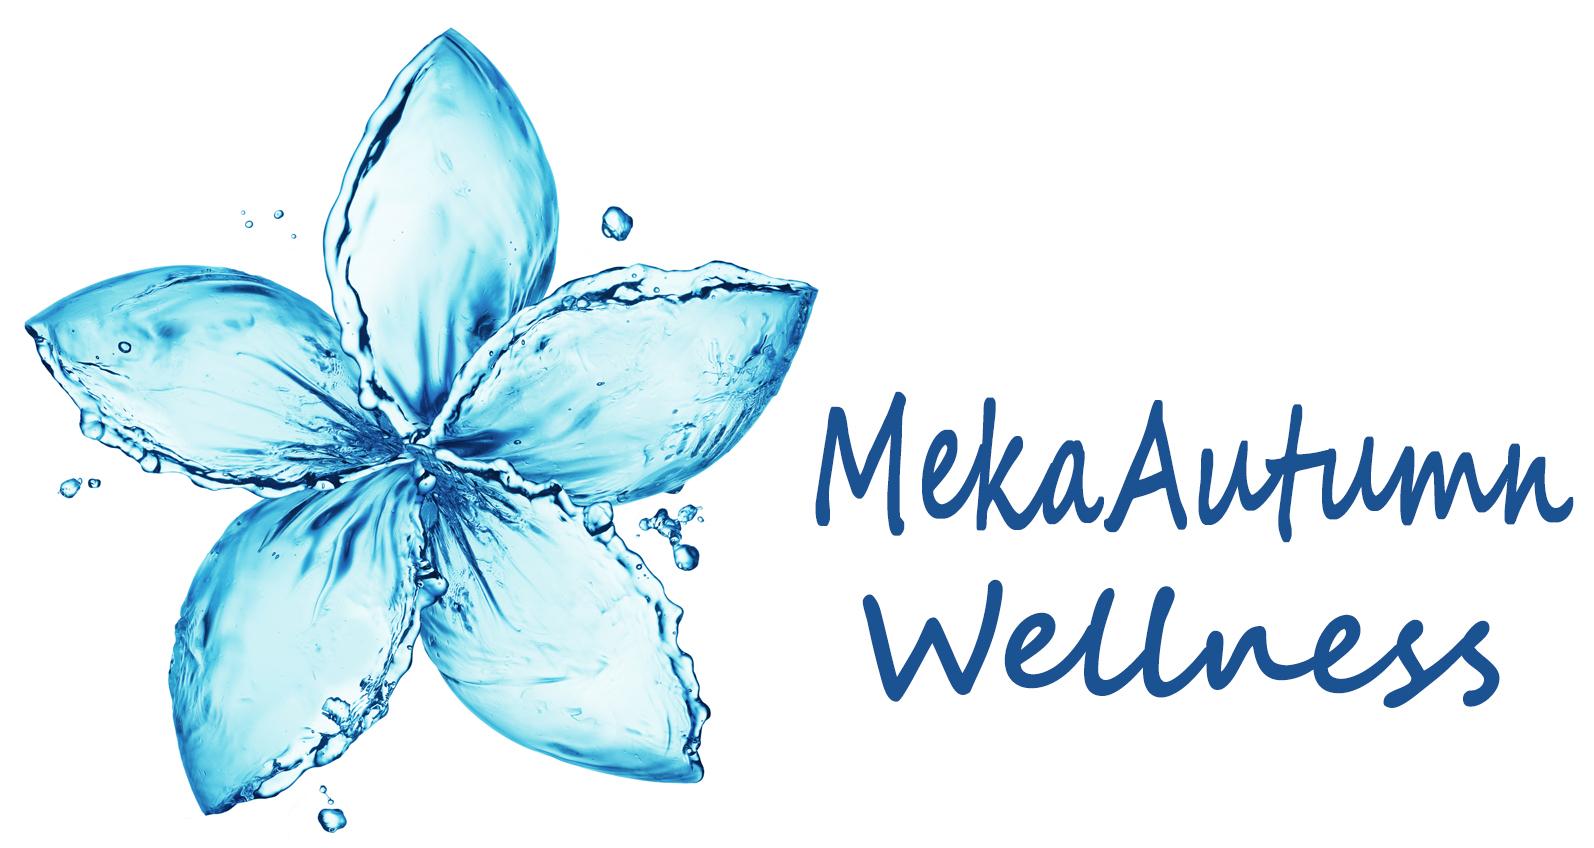 MekaAutumn Wellness